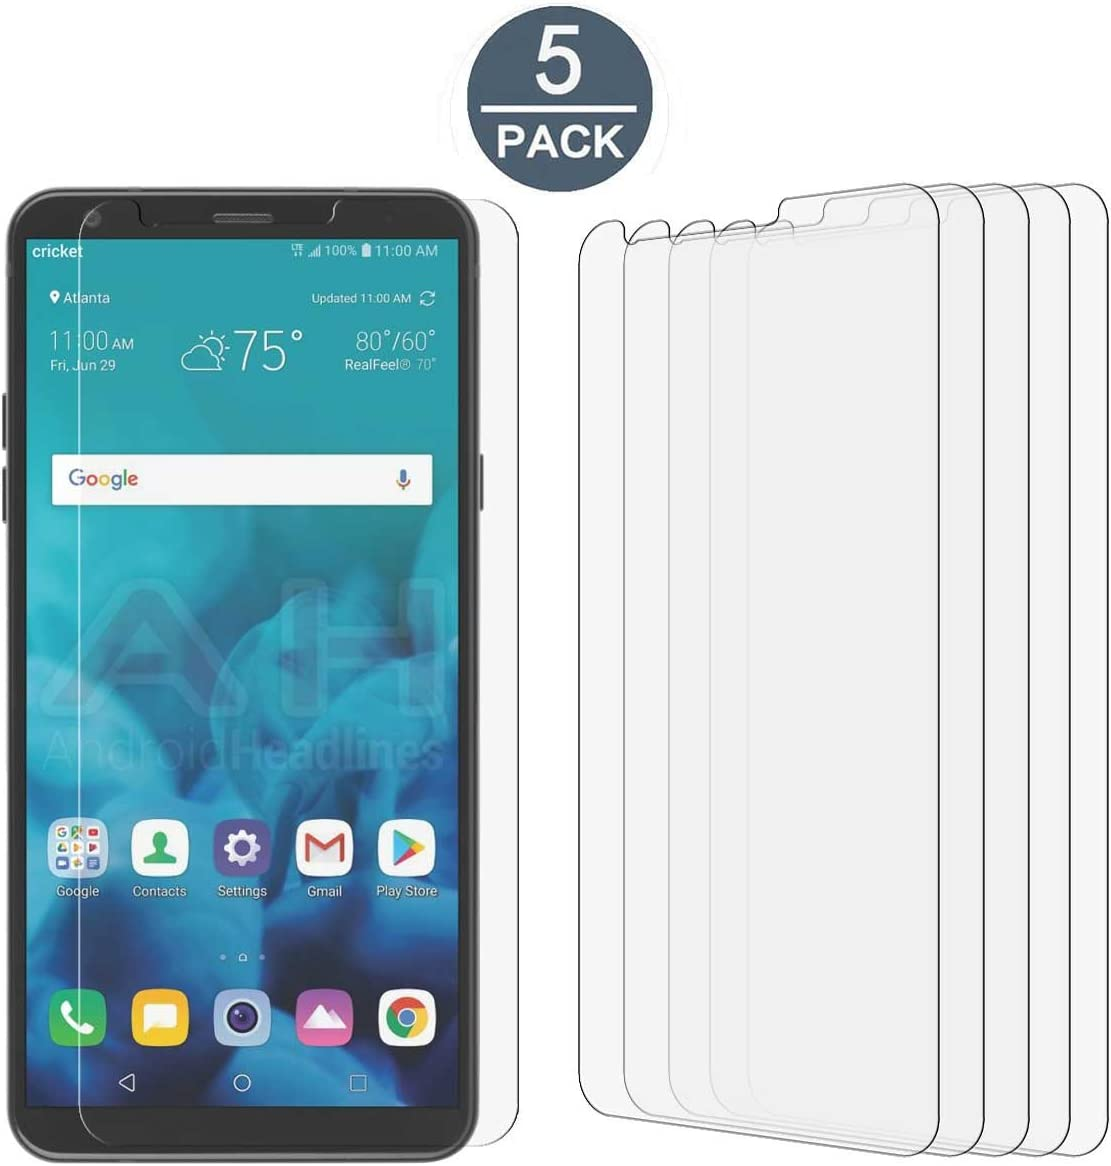 LG Stylo 4 Screen Protector Film, [5 Pack] Tonvizern High Defintion Screen Protector for LG Stylo 4 [Not Glass]